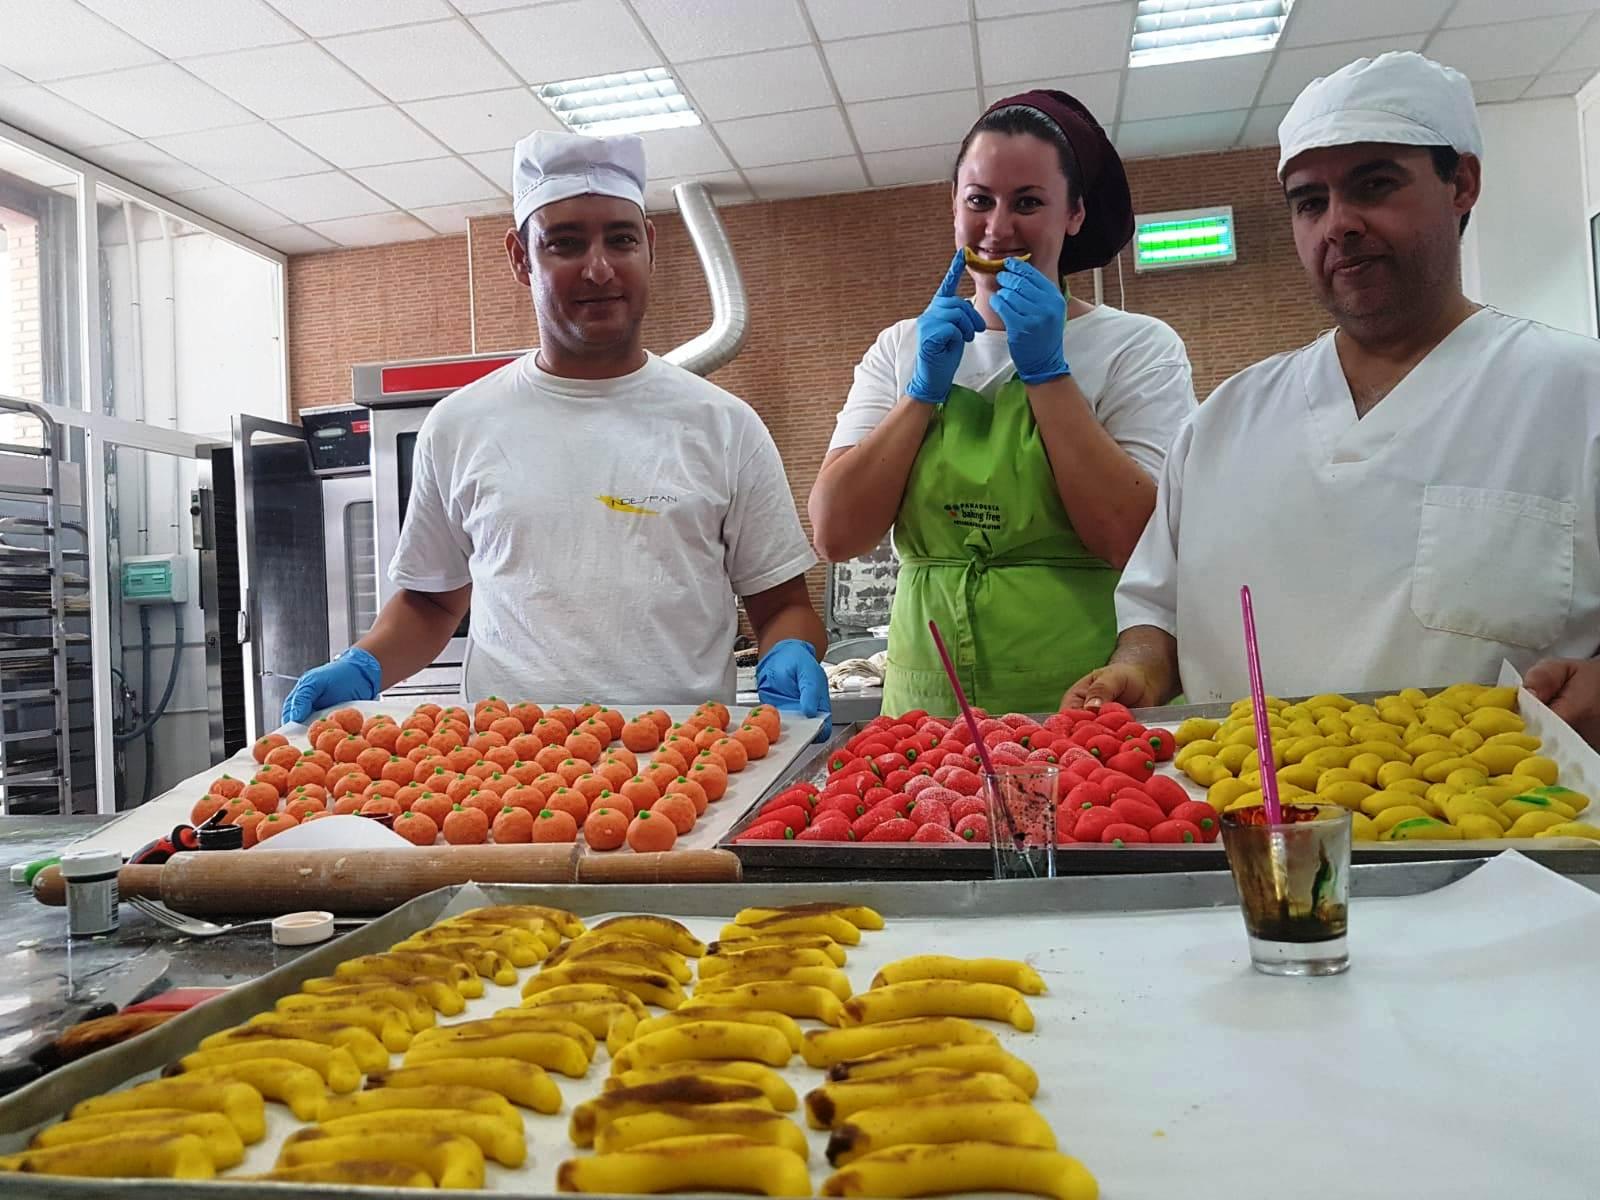 sant donis mocaora sin gluten mazapan 9 d octubre baking free panaderia sin gluten moncada valencia